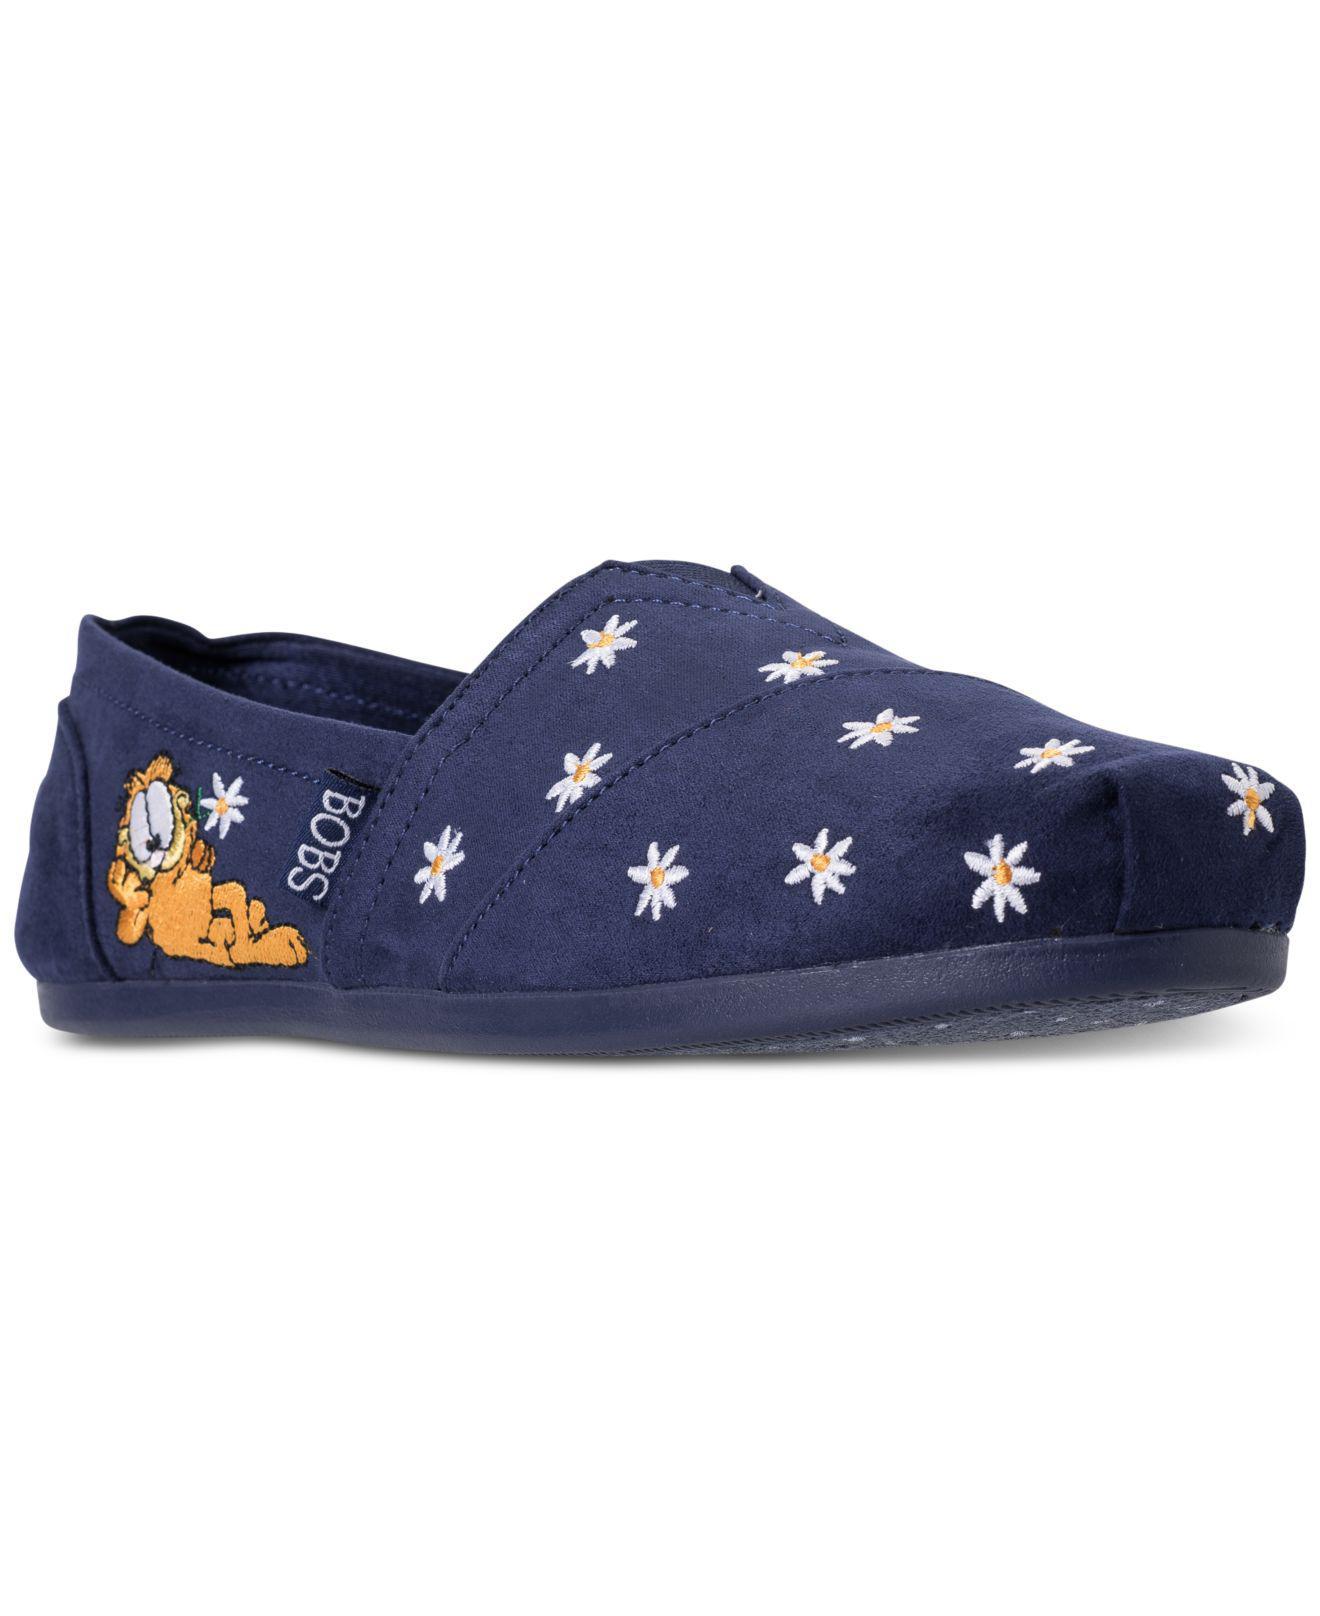 Skechers Women's Bobs Plush - Garfield #Bestie Bobs for Dogs Casual Slip-On Flats from Finish Line suyxUj